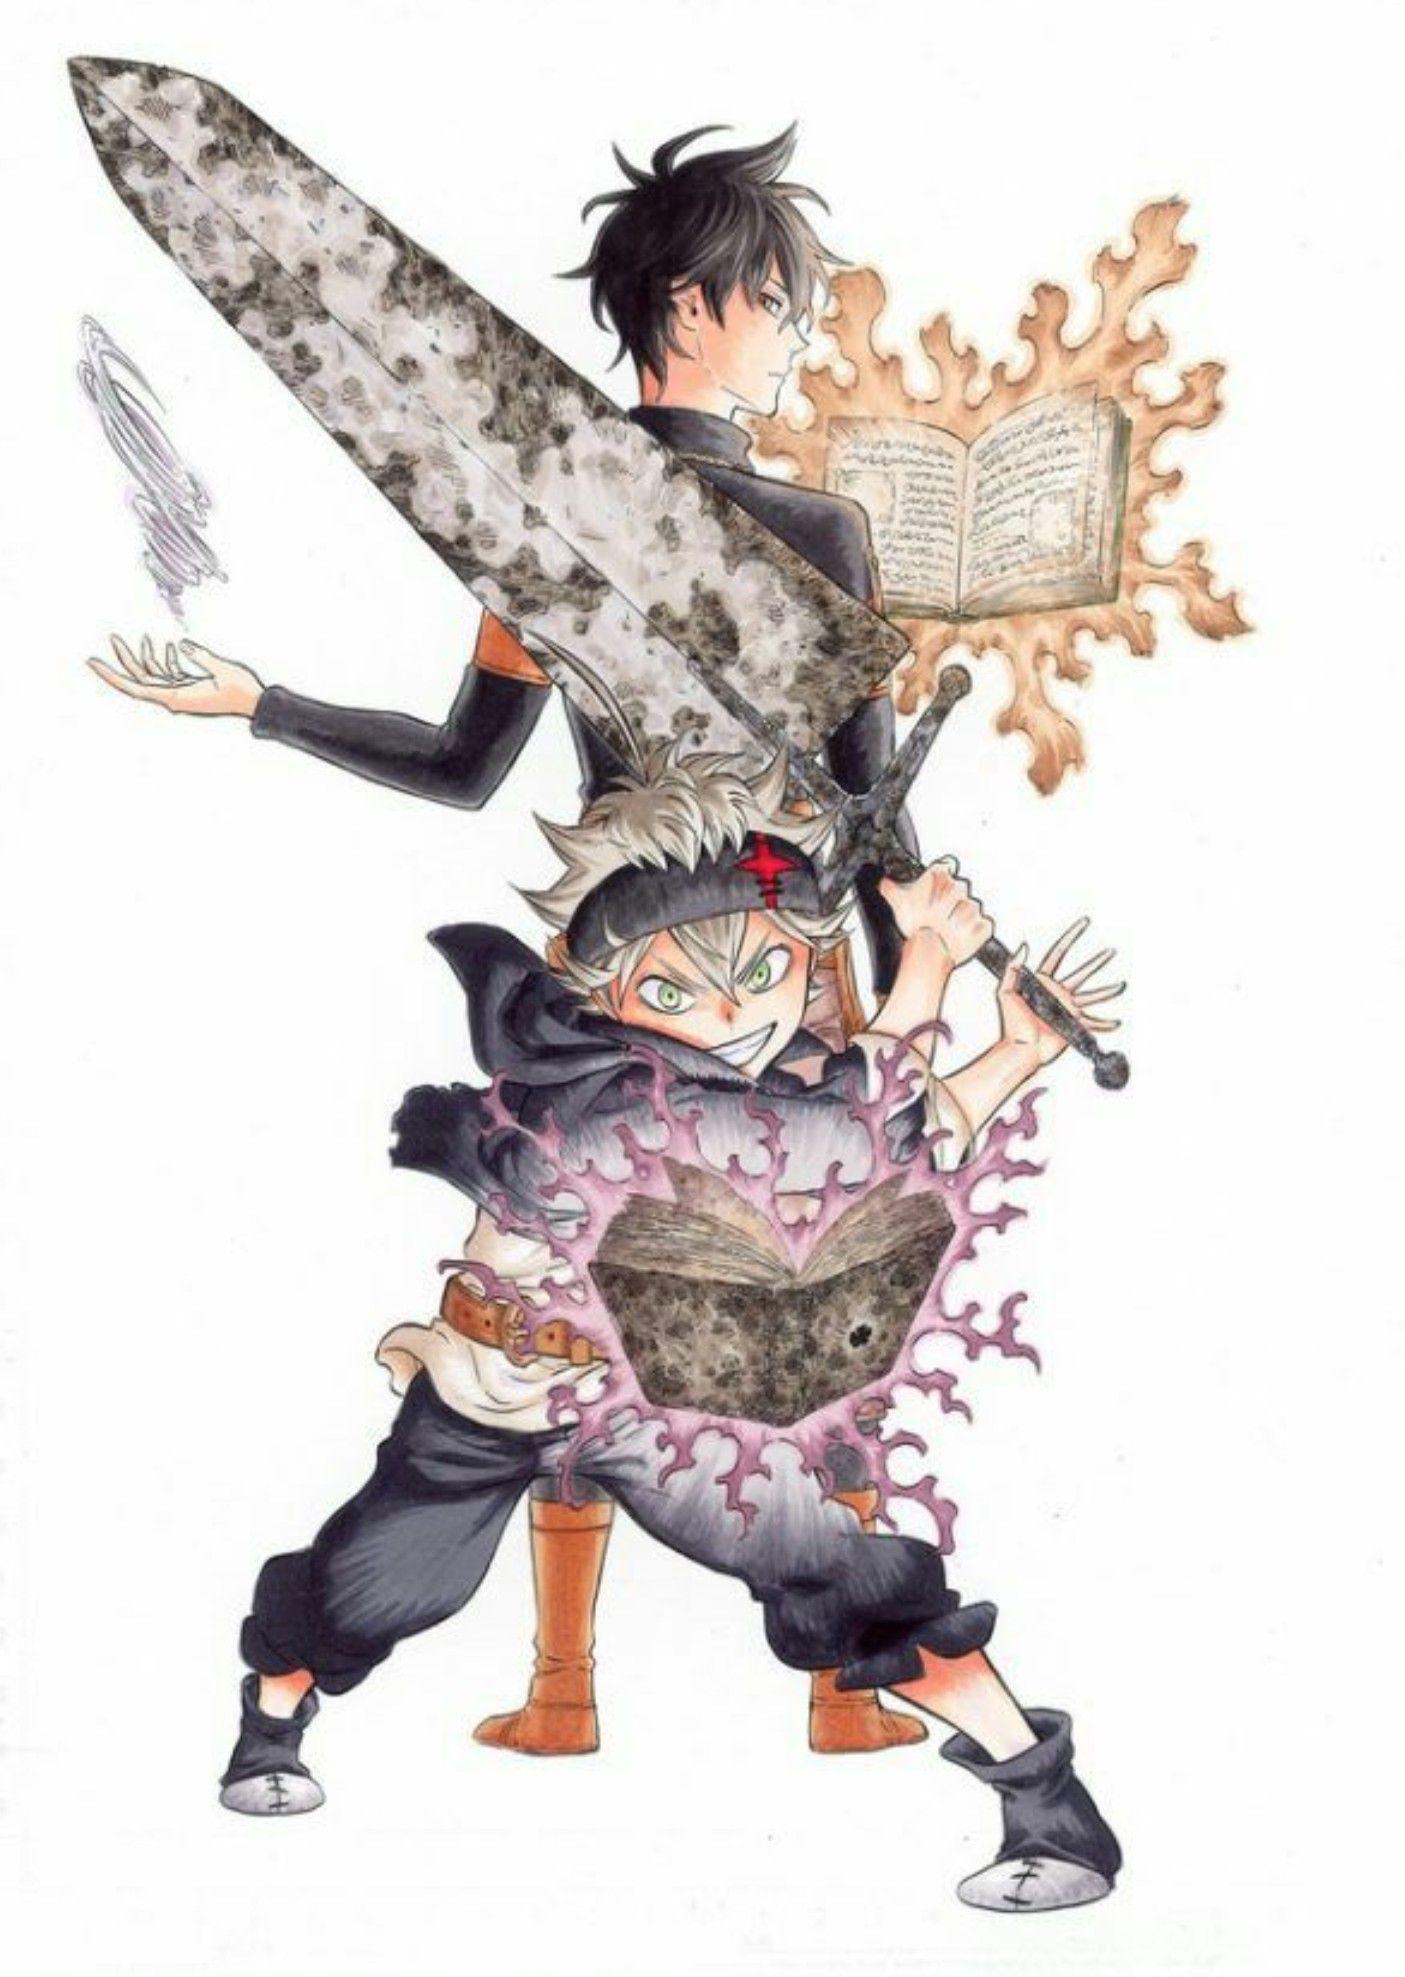 Pin by Mirian L. D on Anime & Cartoons Black clover